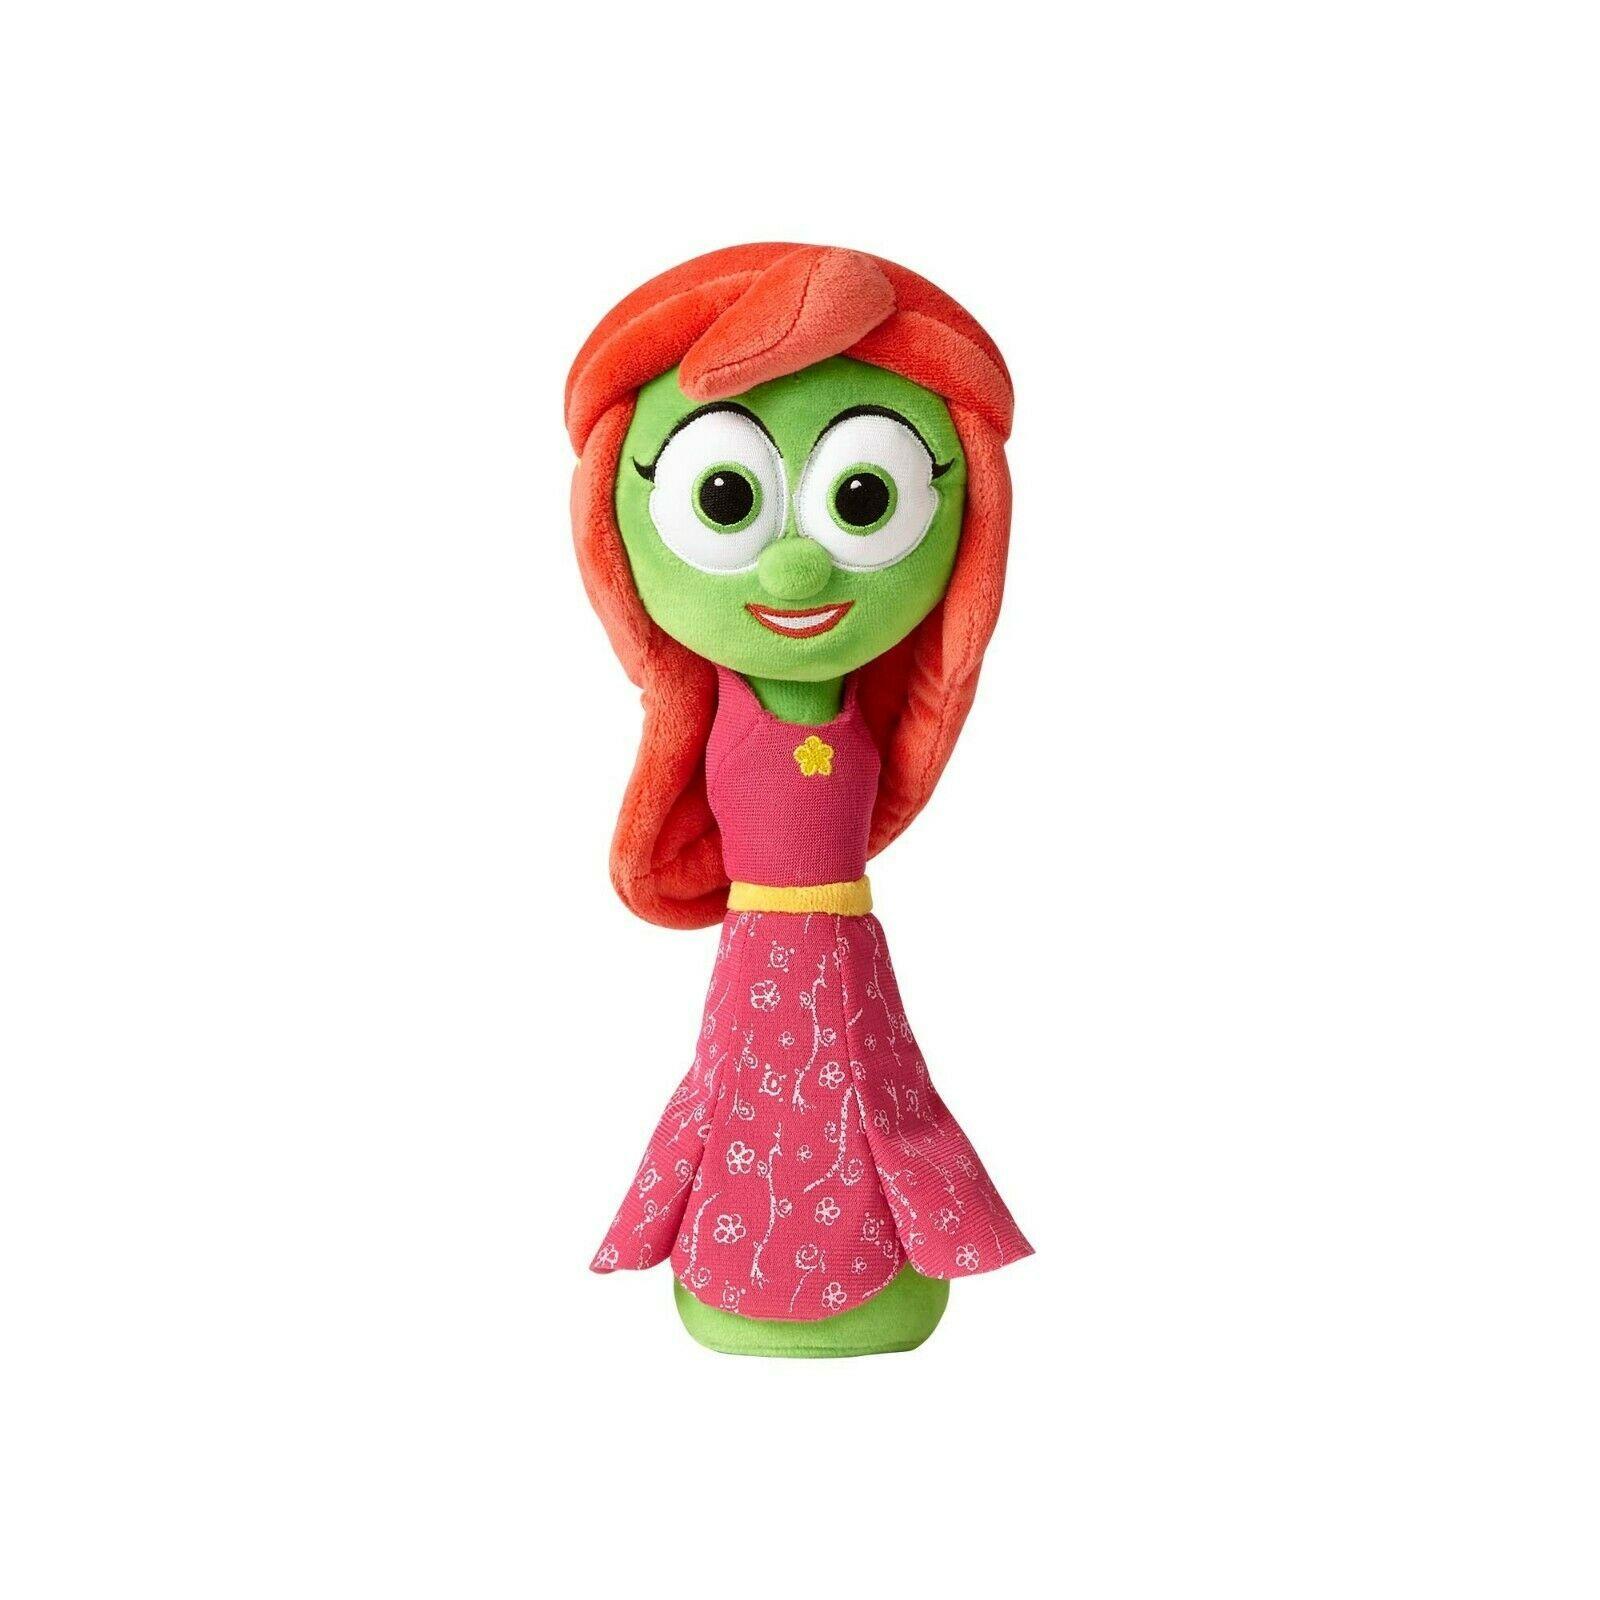 "Enesco Veggietales Petunia Rhubarb Plush Doll Toy 11"" Tall Super Soft Veggie"